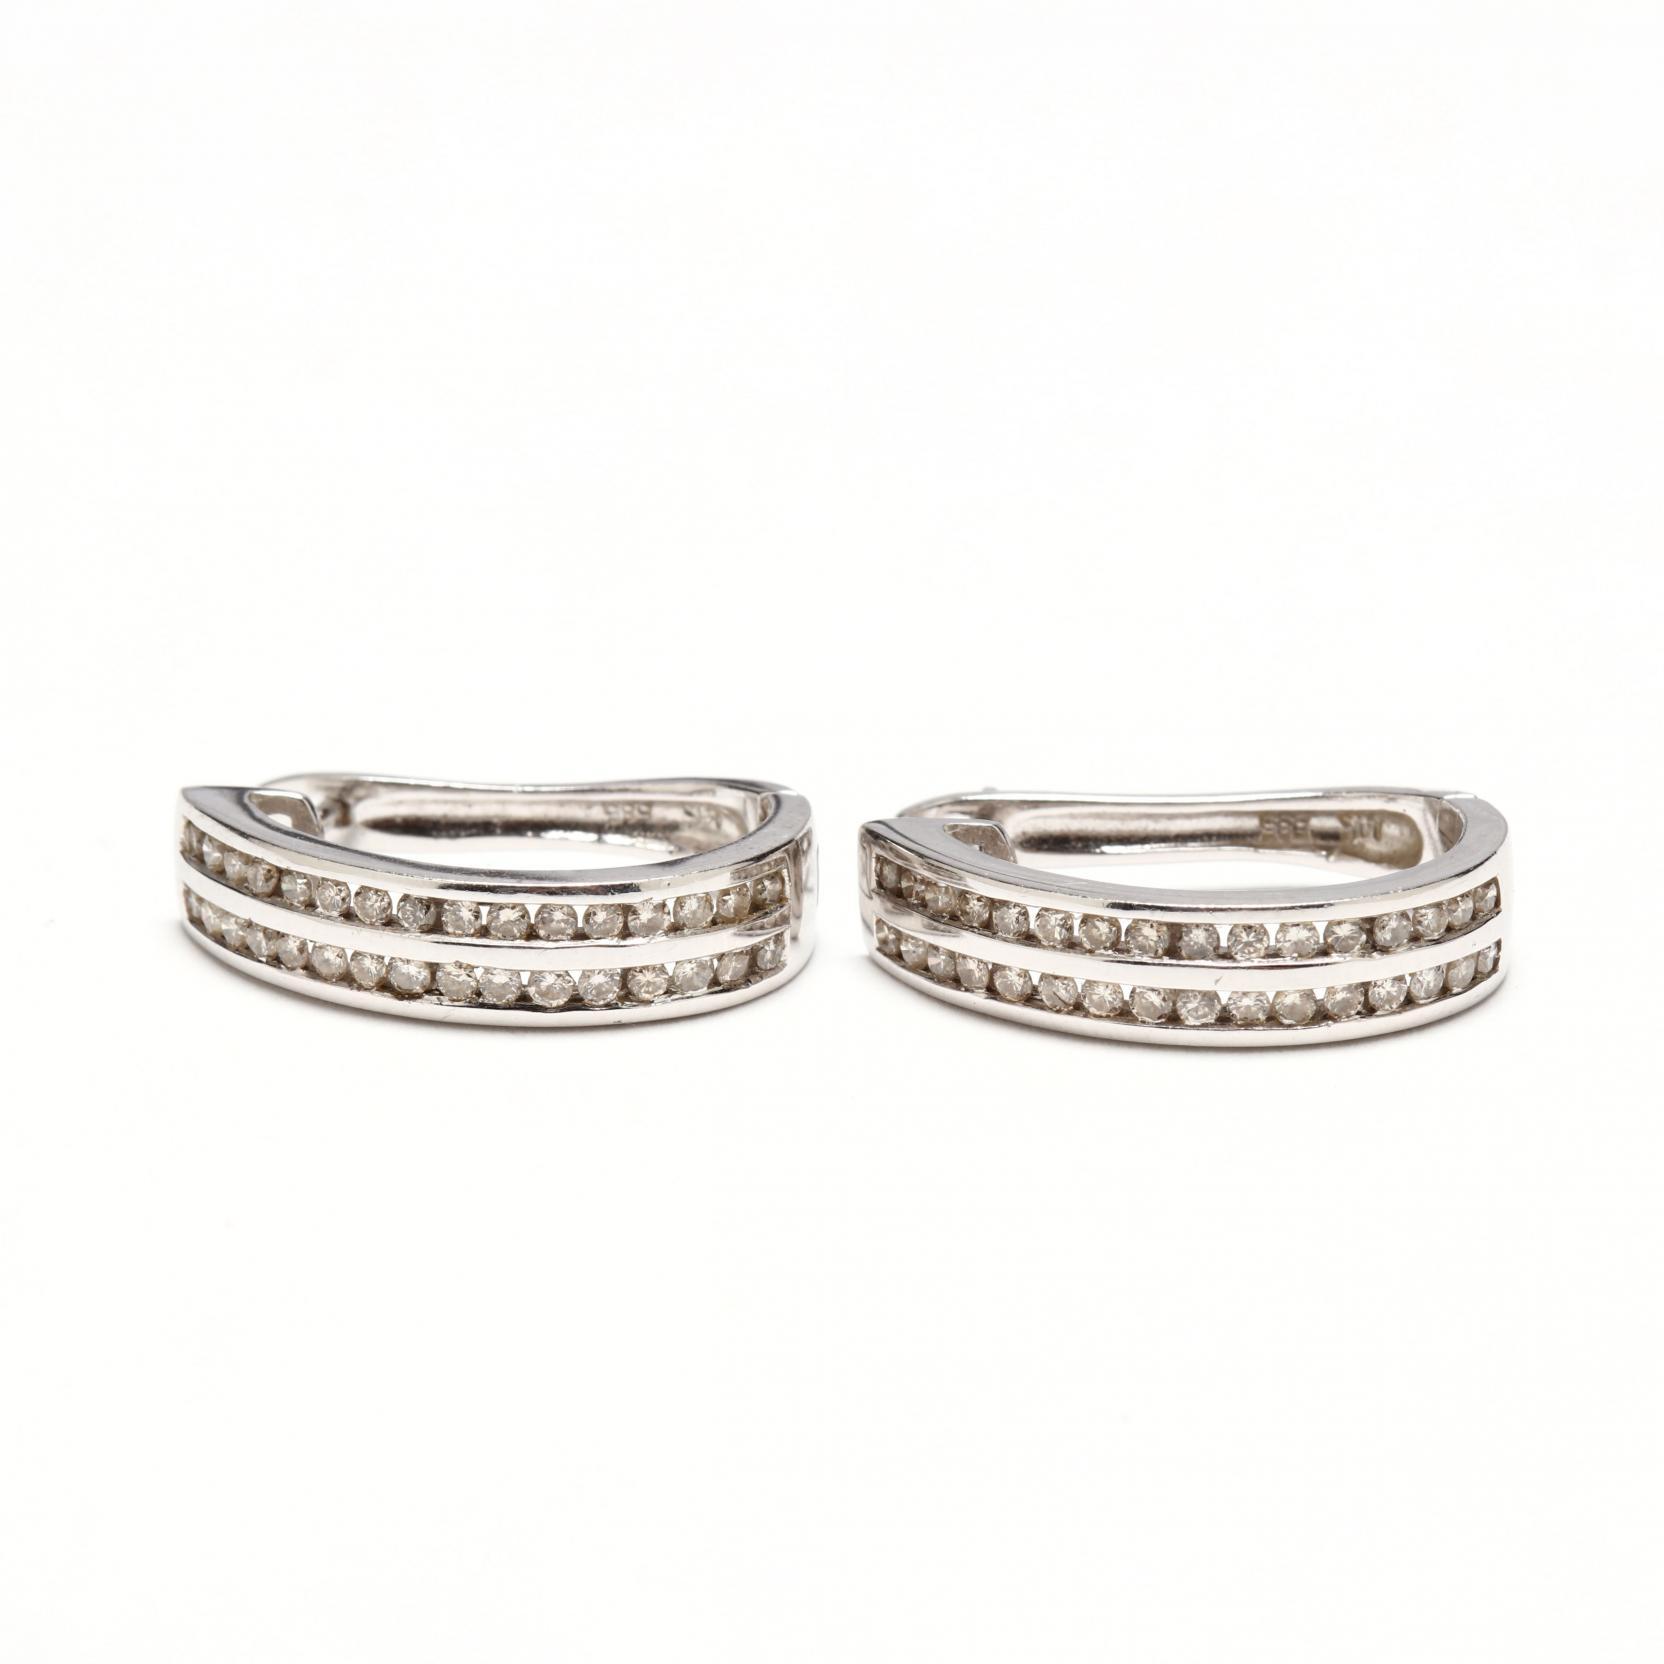 14kt-white-gold-and-diamond-earrings